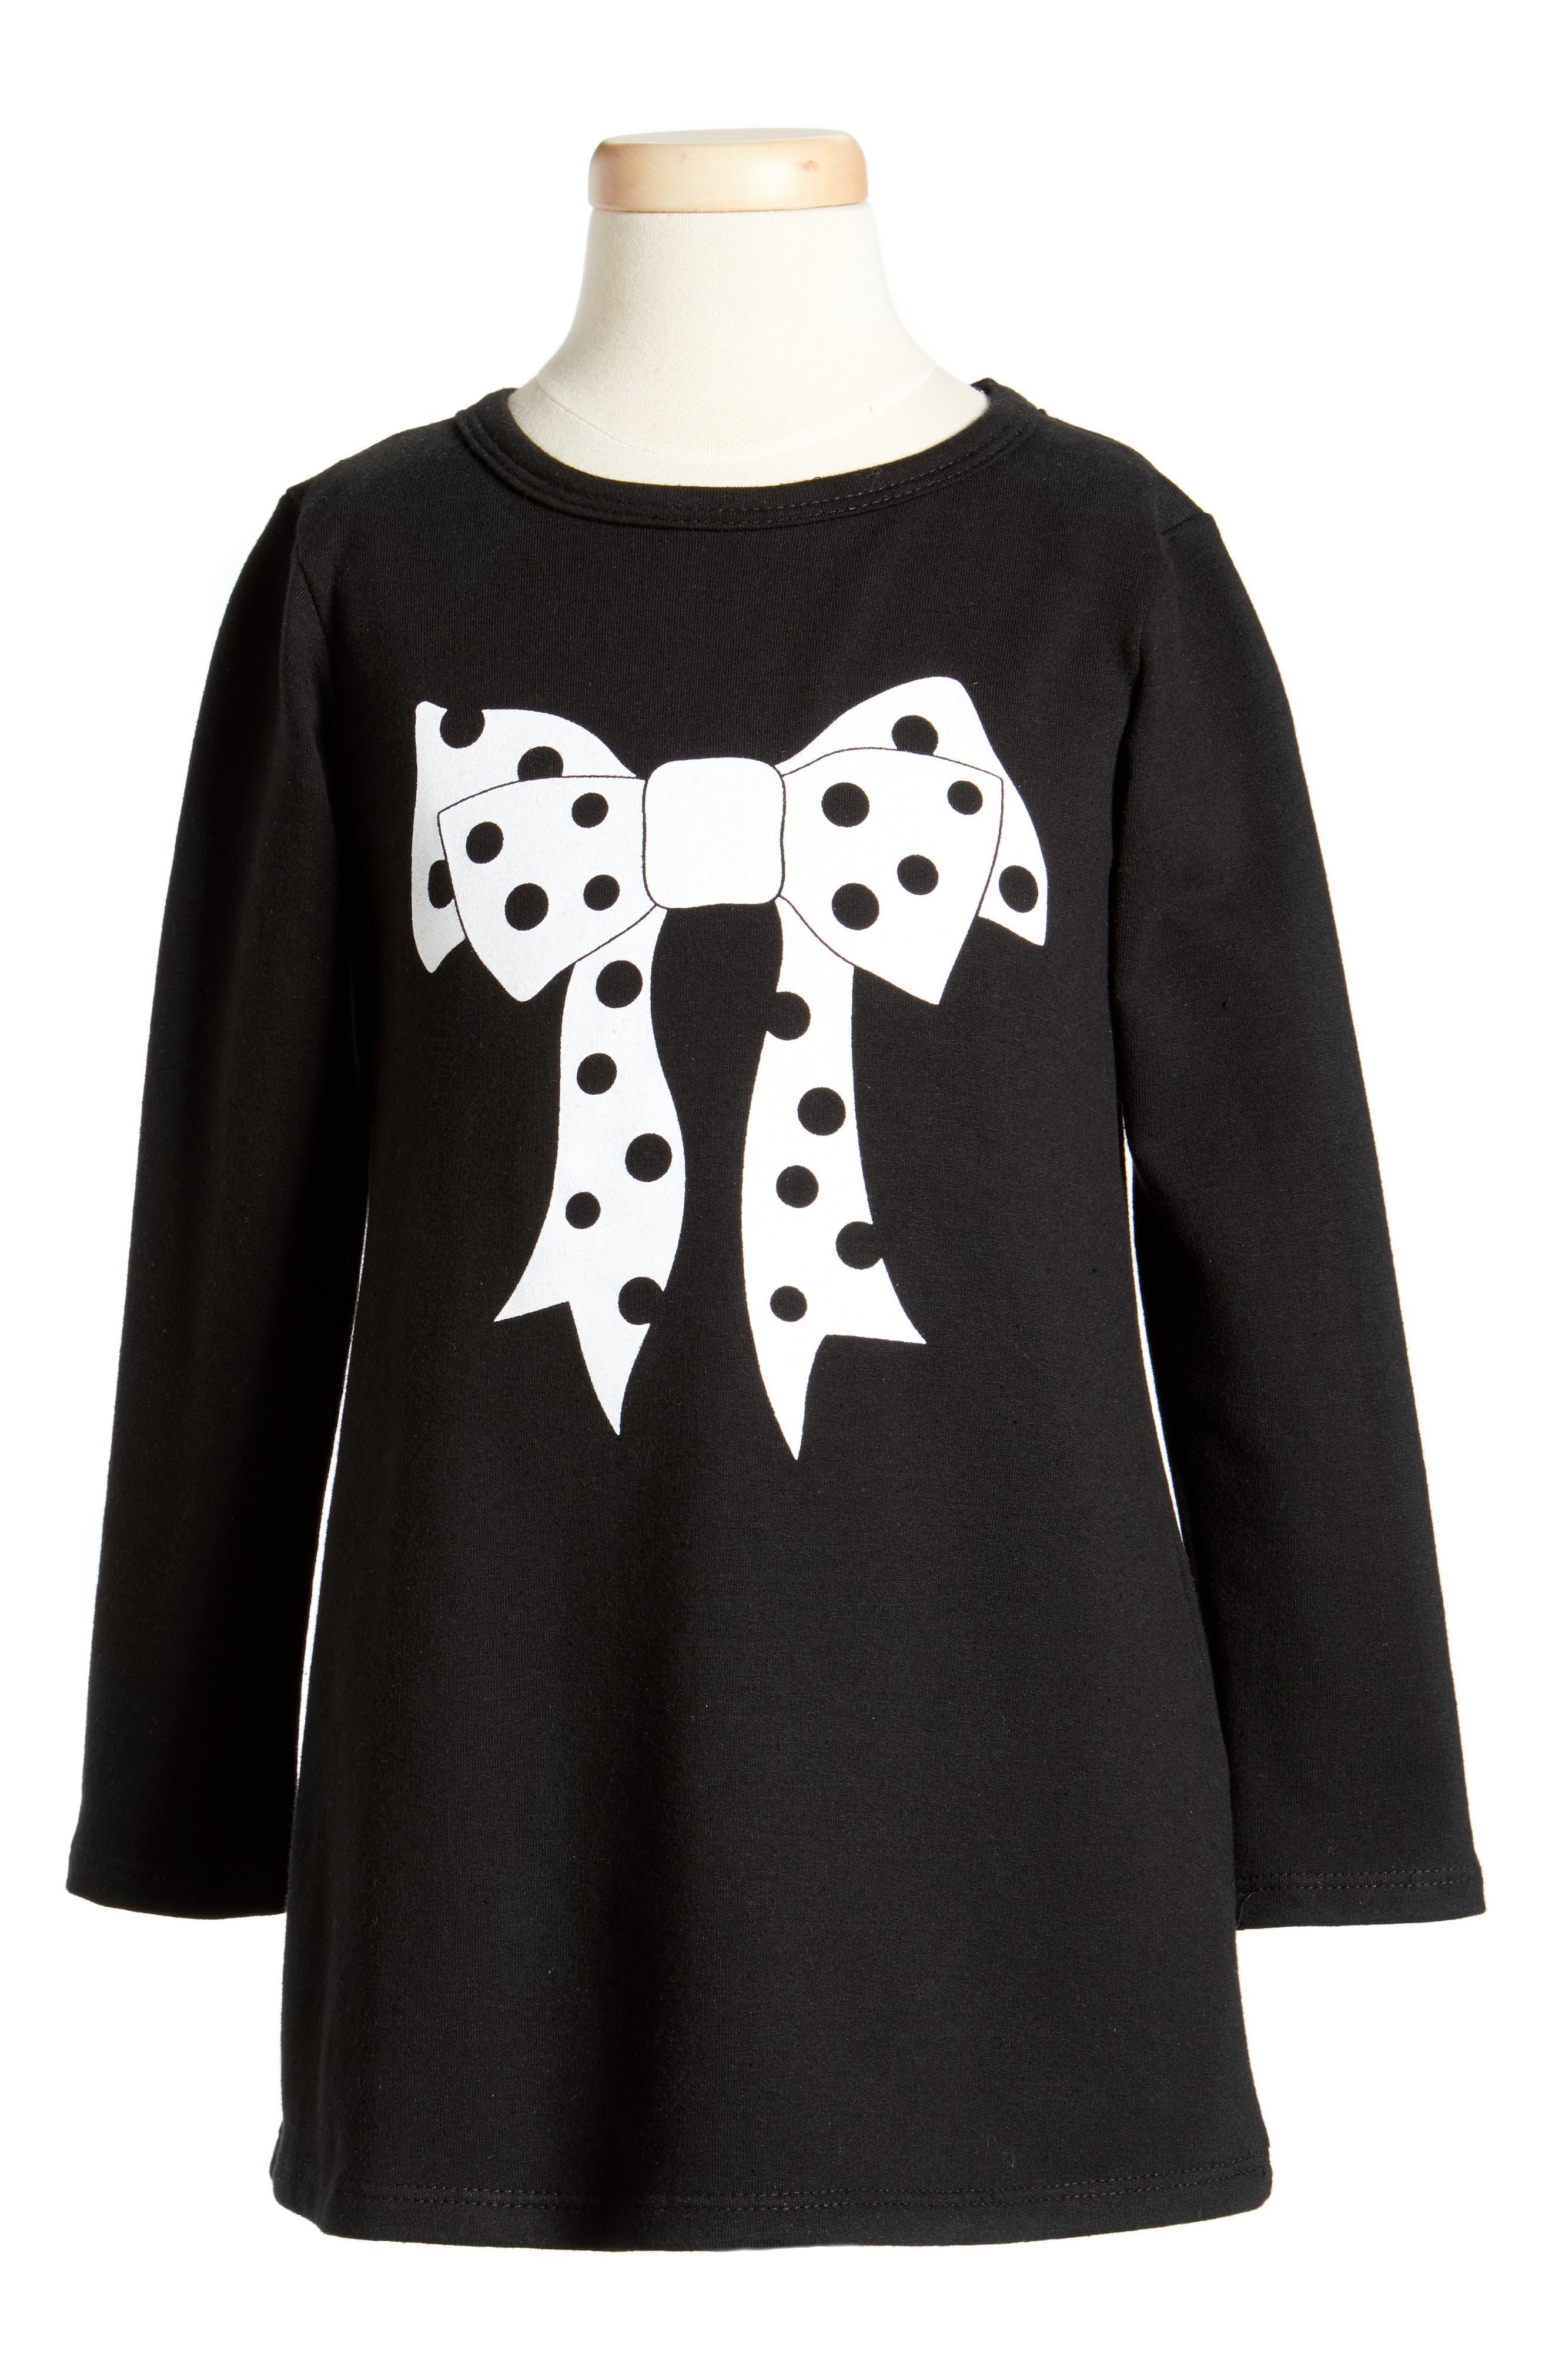 Alternate Image 1 Selected - Cotton Emporium Bow Dress (Toddler Girls, Little Girls & Big Girls)